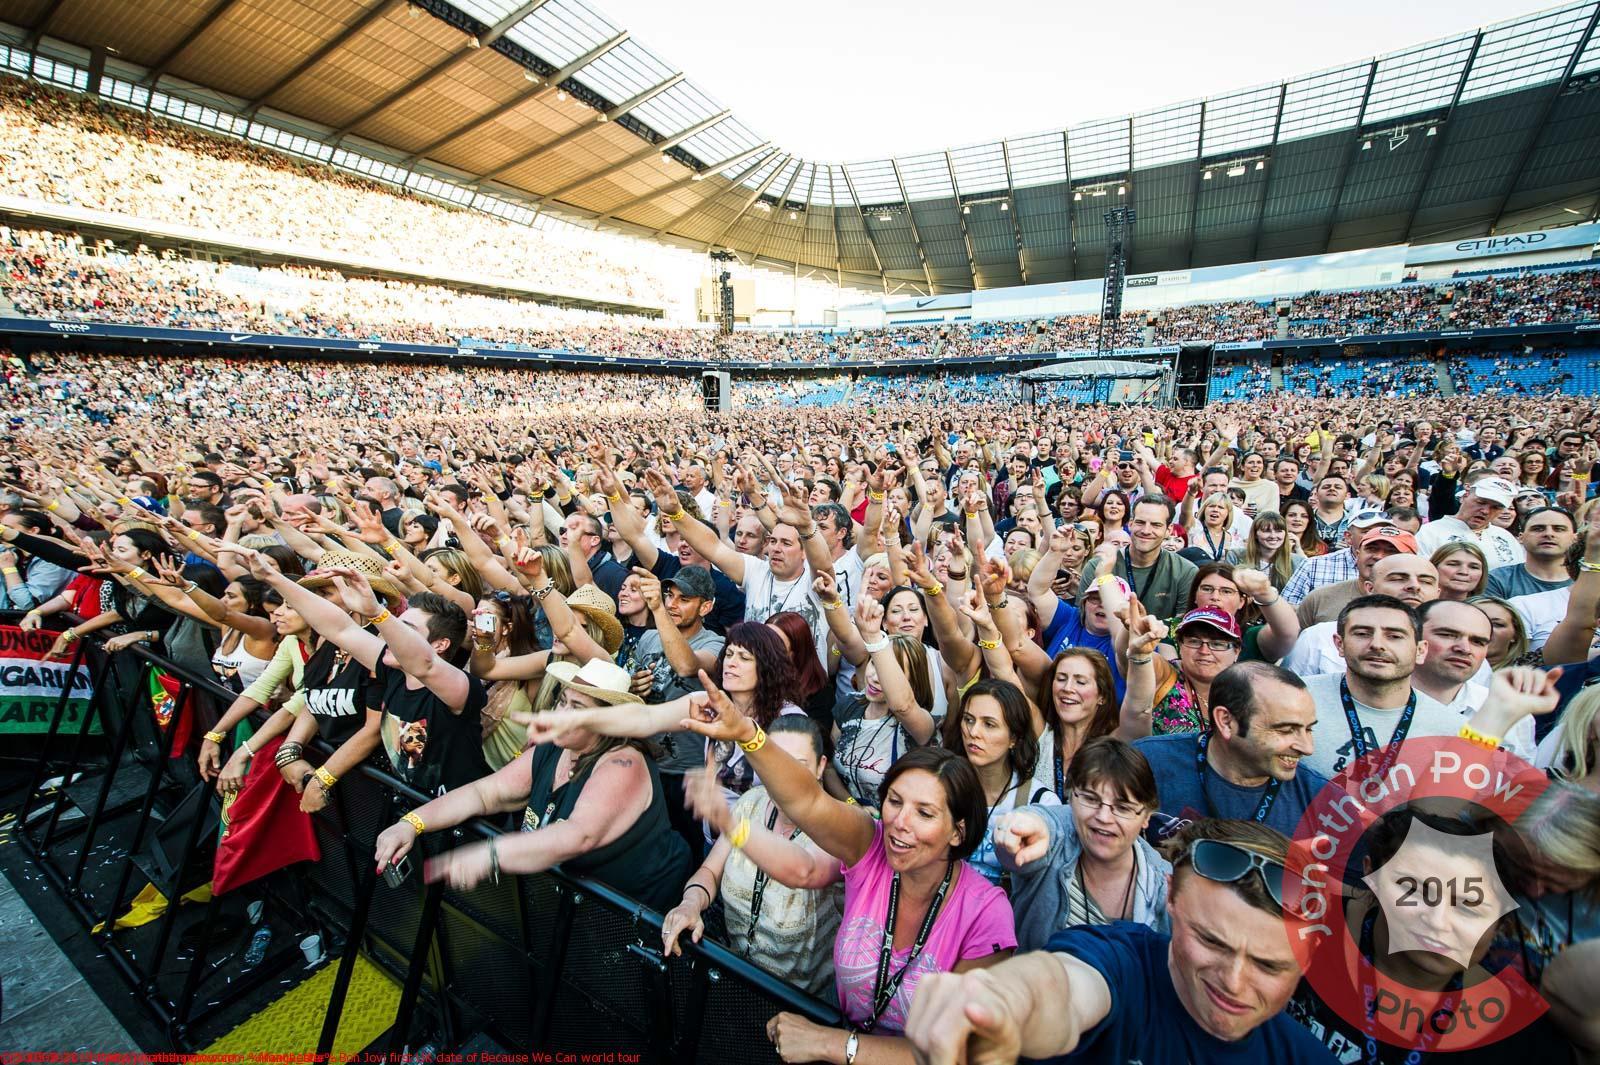 Manchester - Bon Jovi first UK date of Because We Can world tour